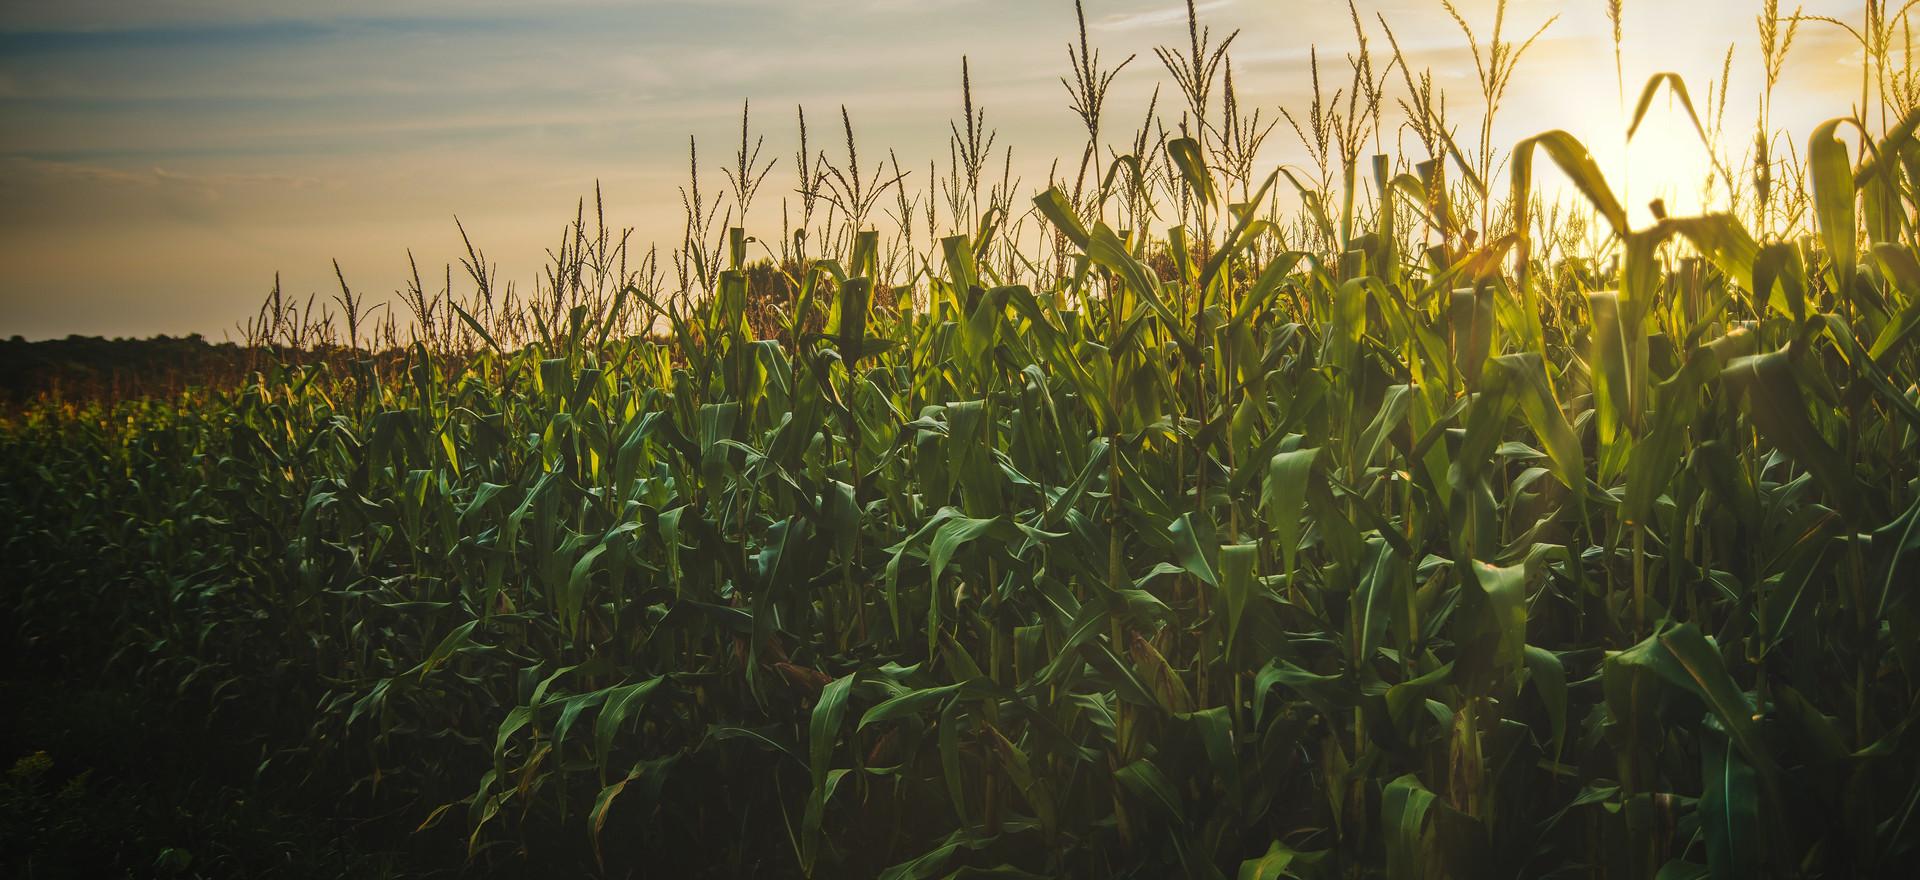 corn-field-1382102.jpg